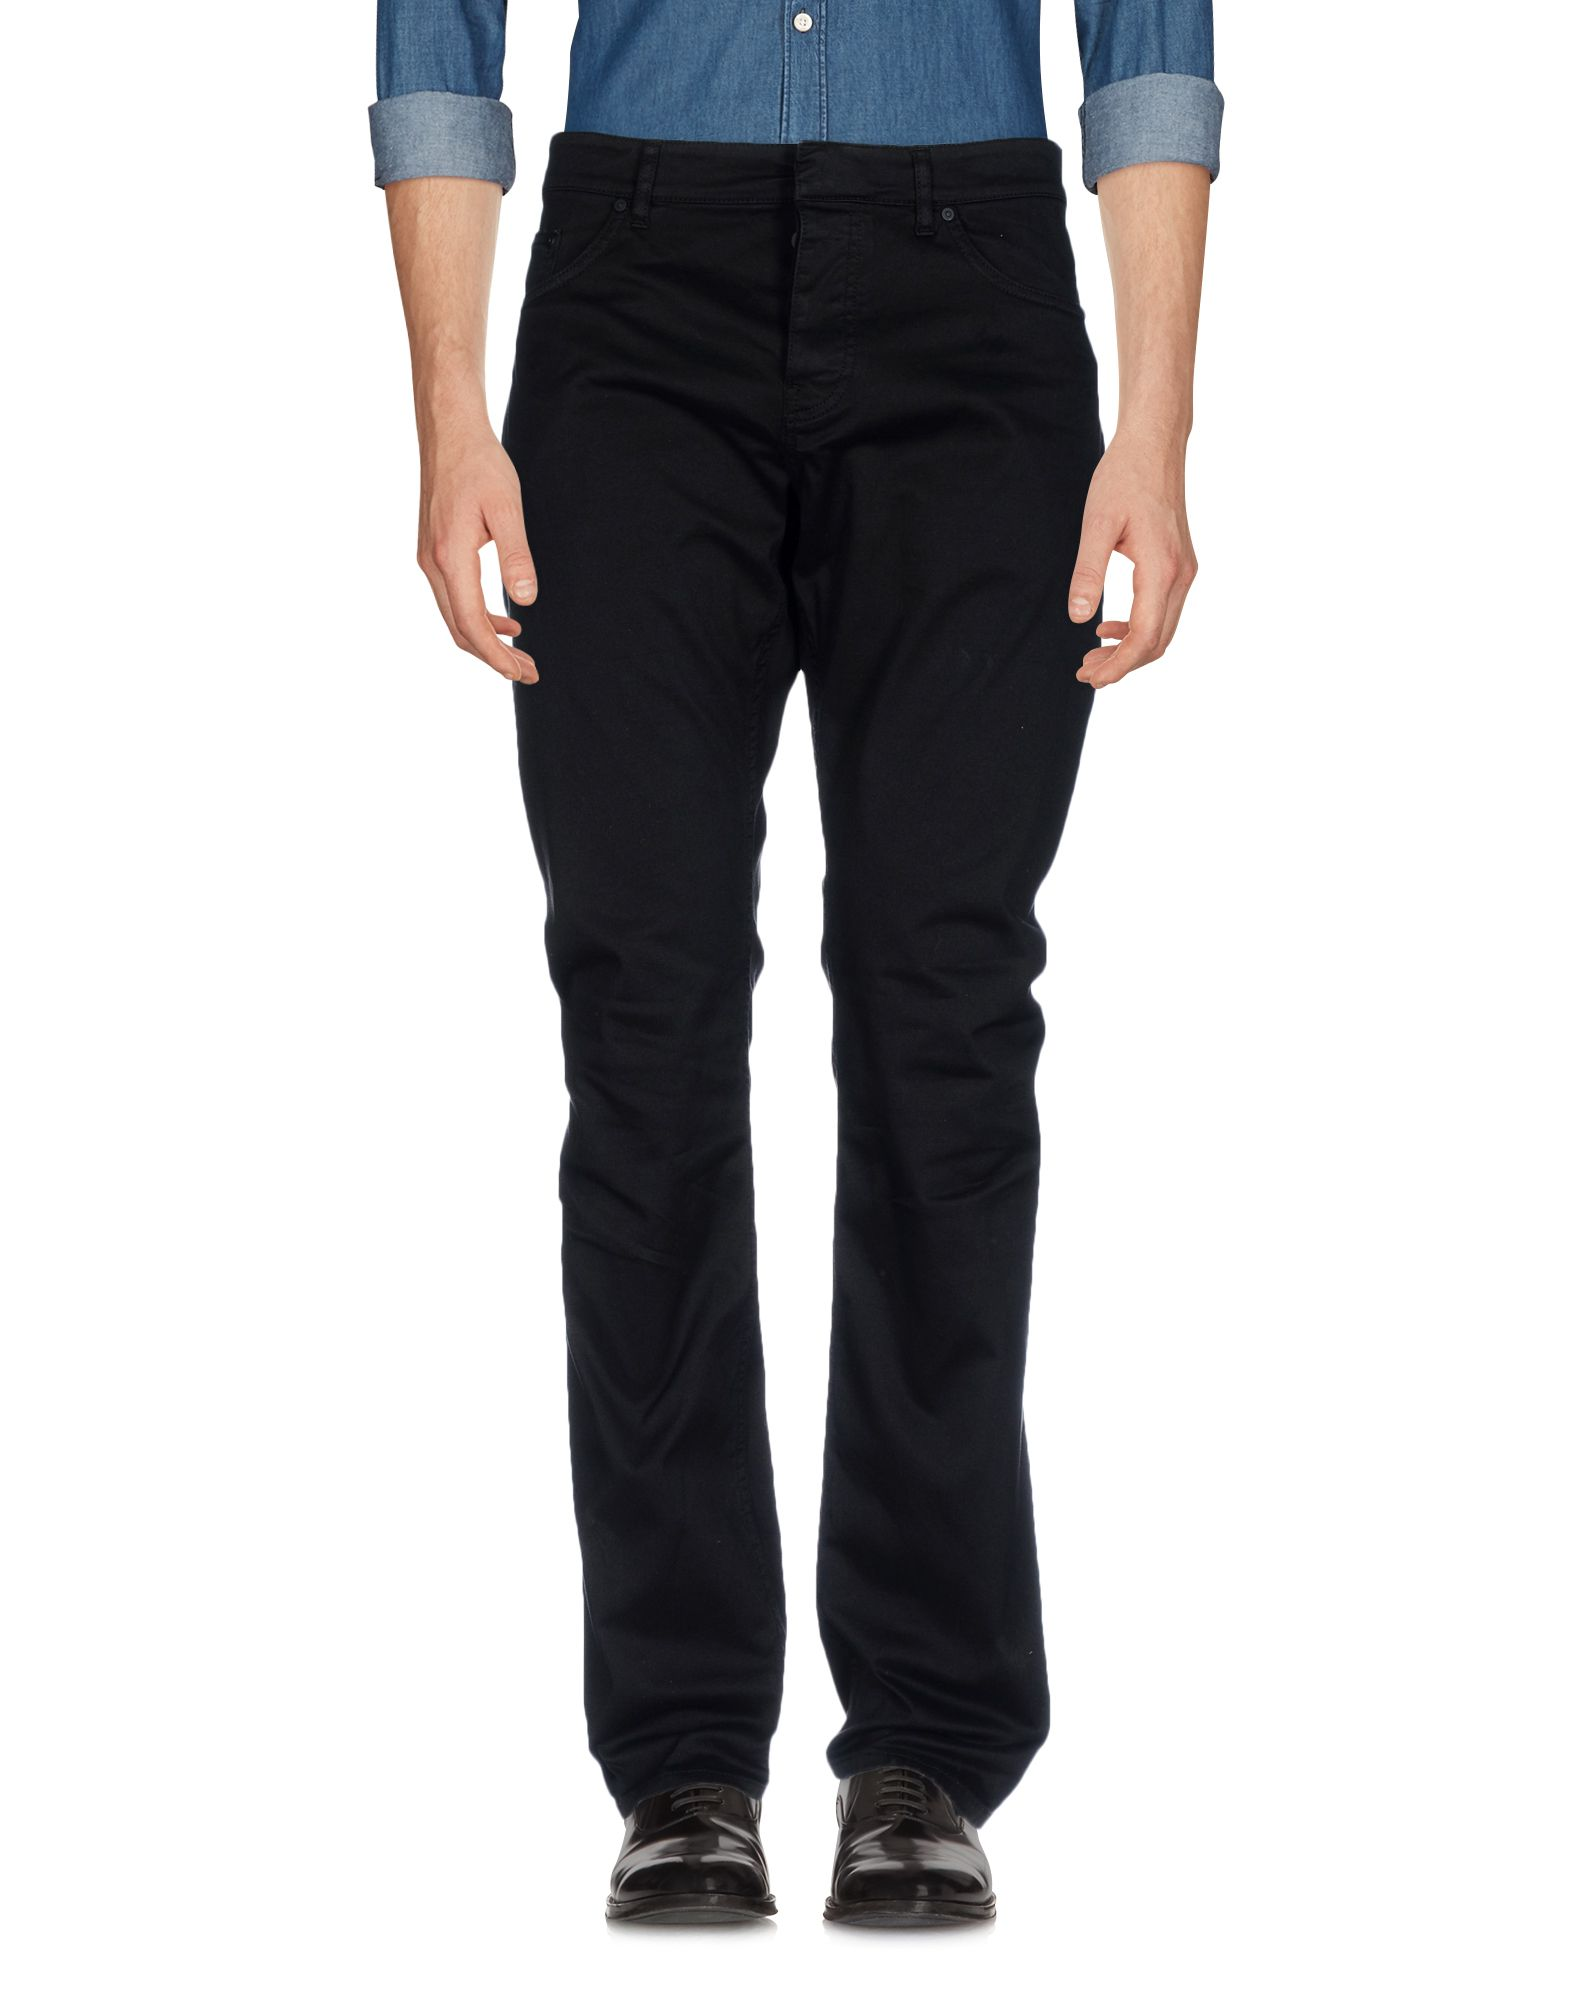 5 Tasche Balenciaga Uomo - Acquista online su